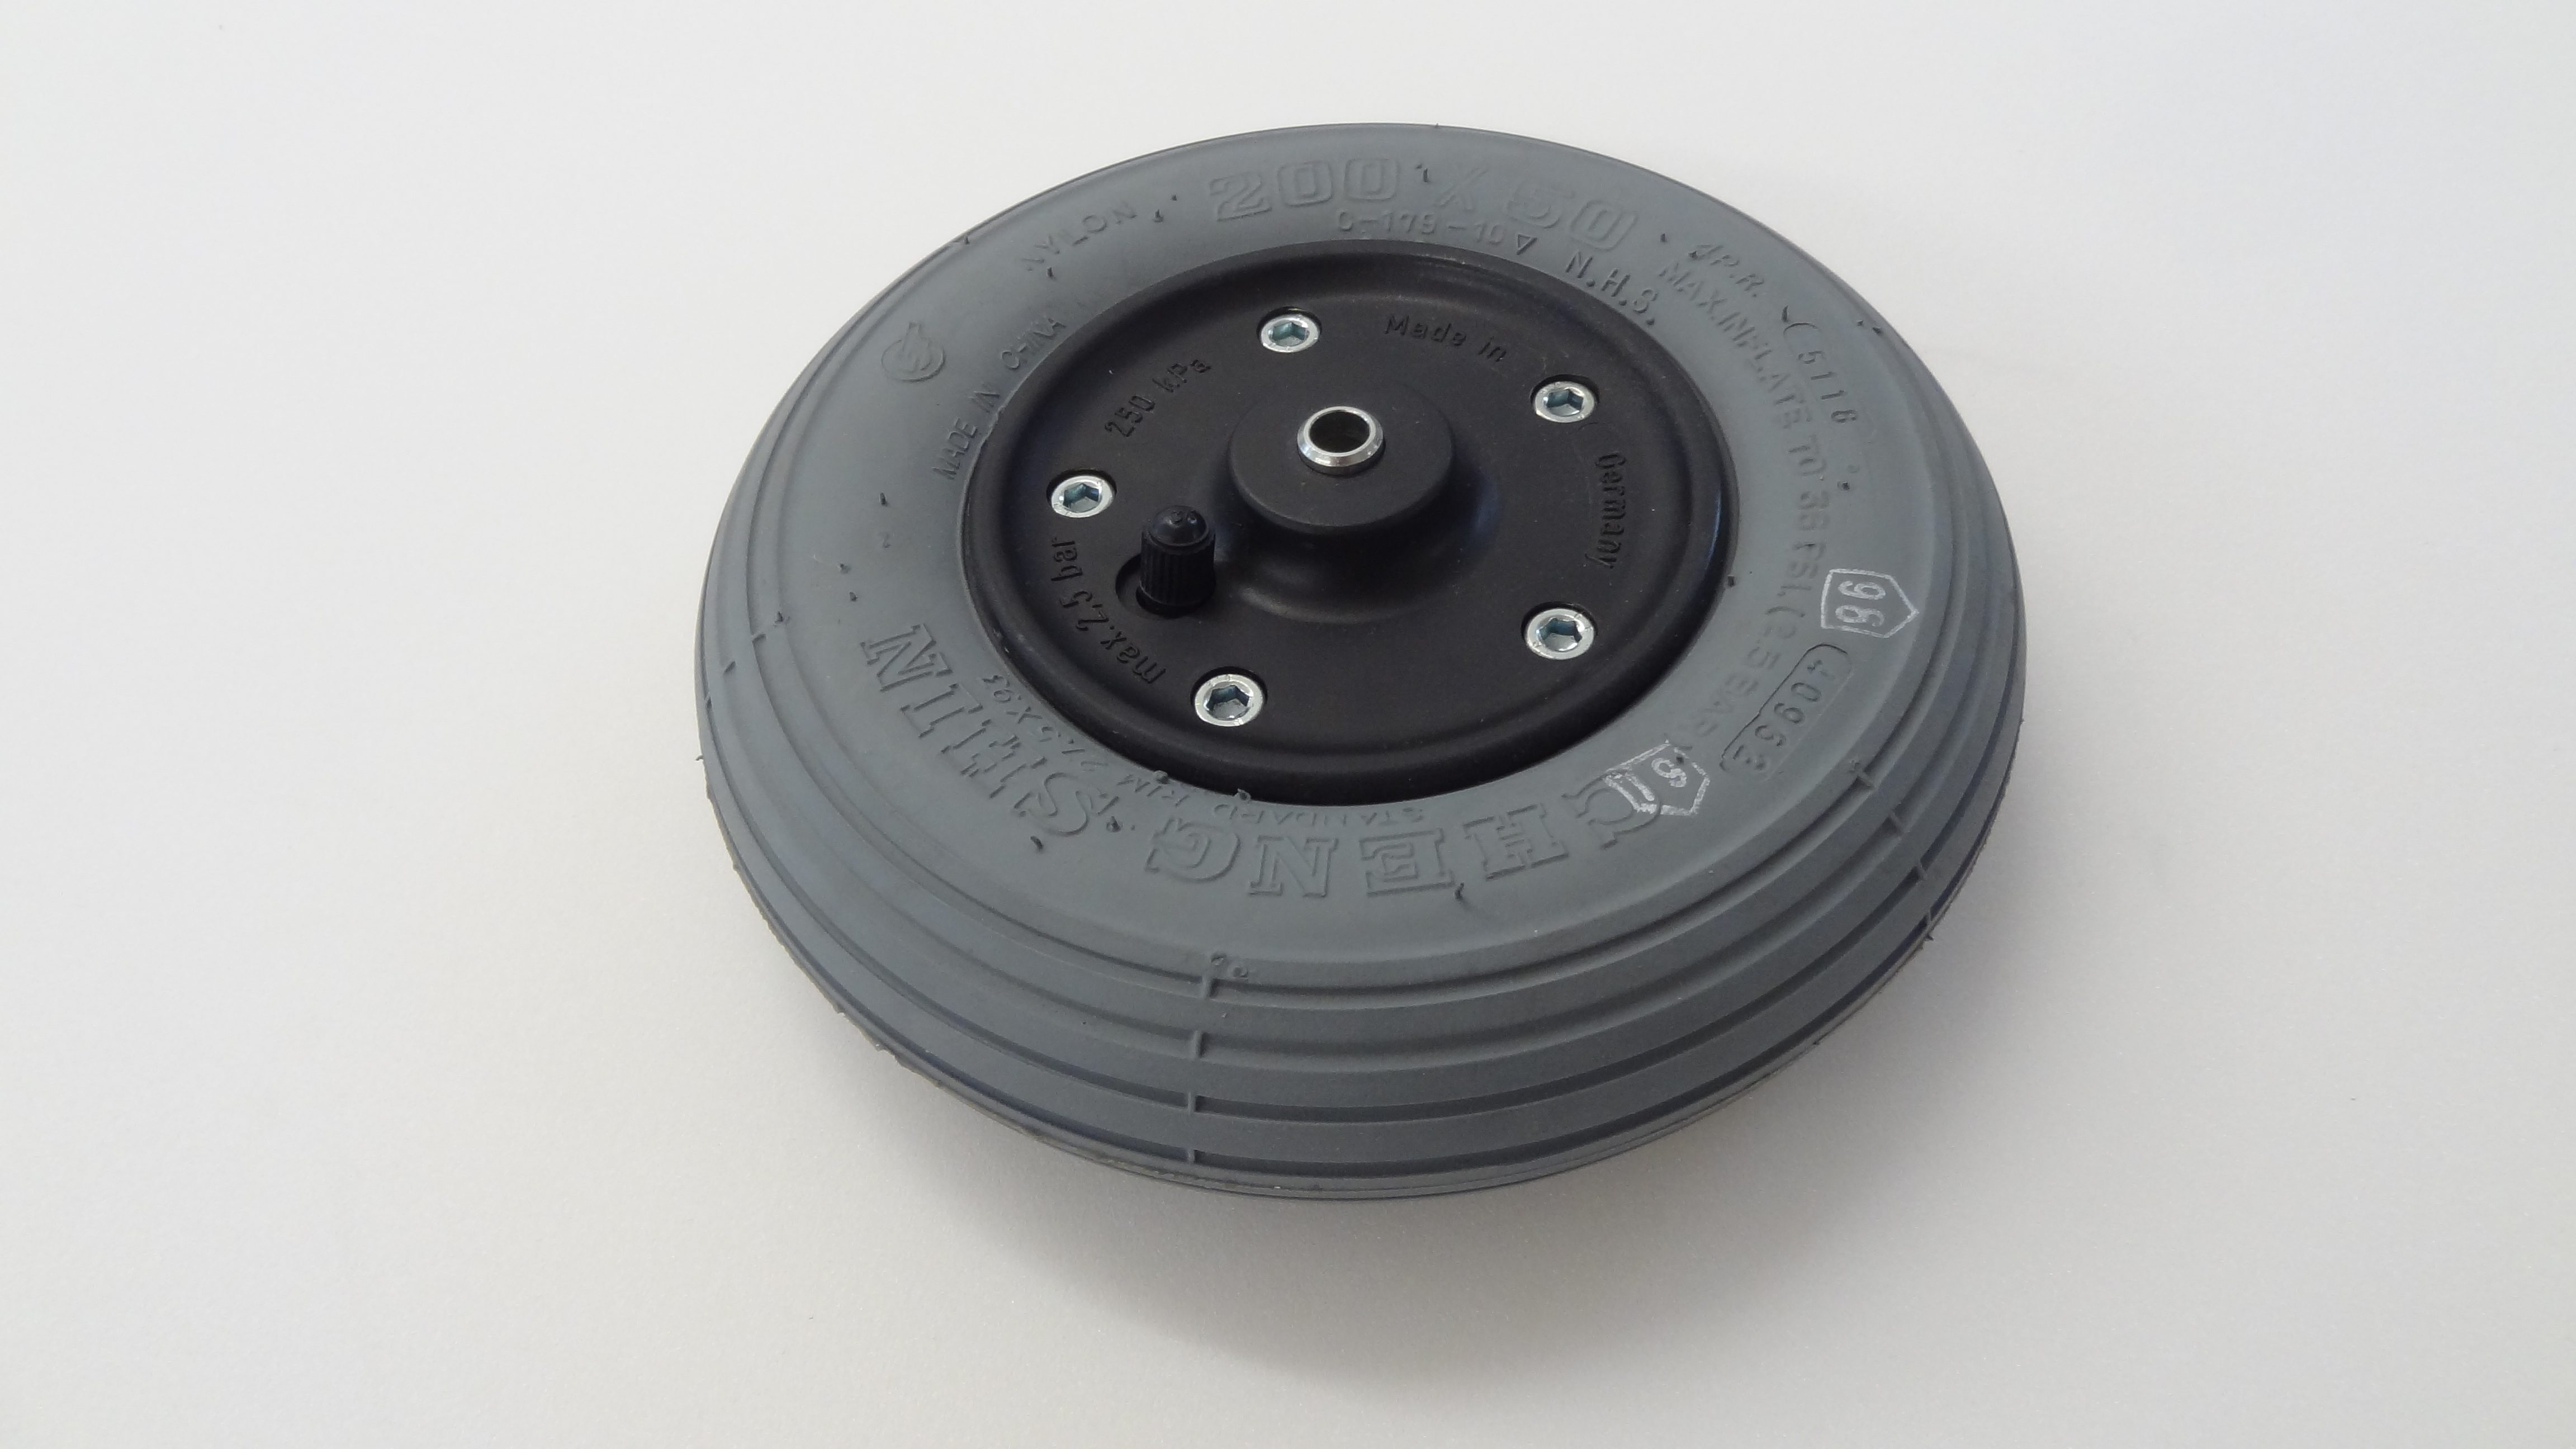 Rad, 2-teilige Felge, Schwarz, Luftbereifung, Grau